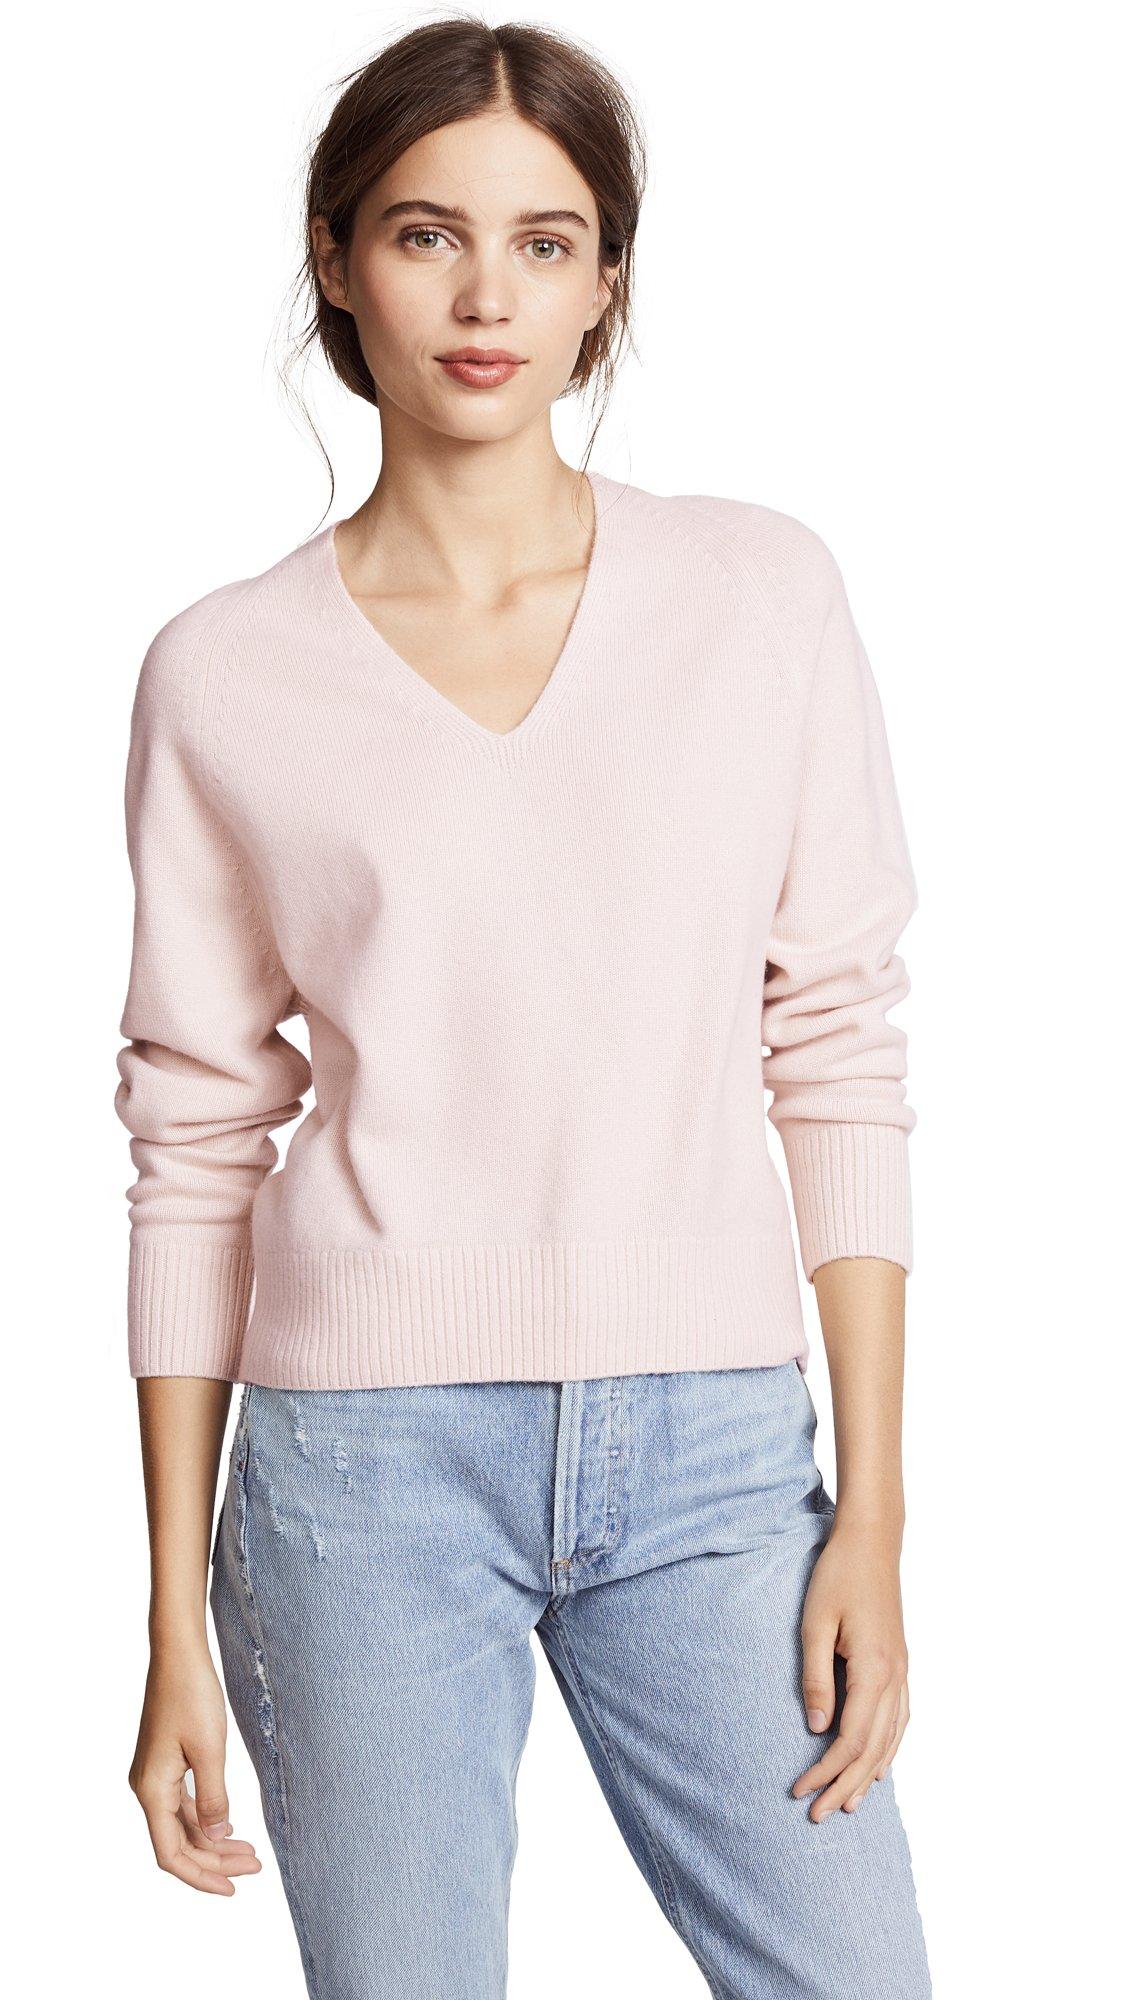 Vince Women's Deep V Neck Cashmere Sweater, Sandstone, Medium